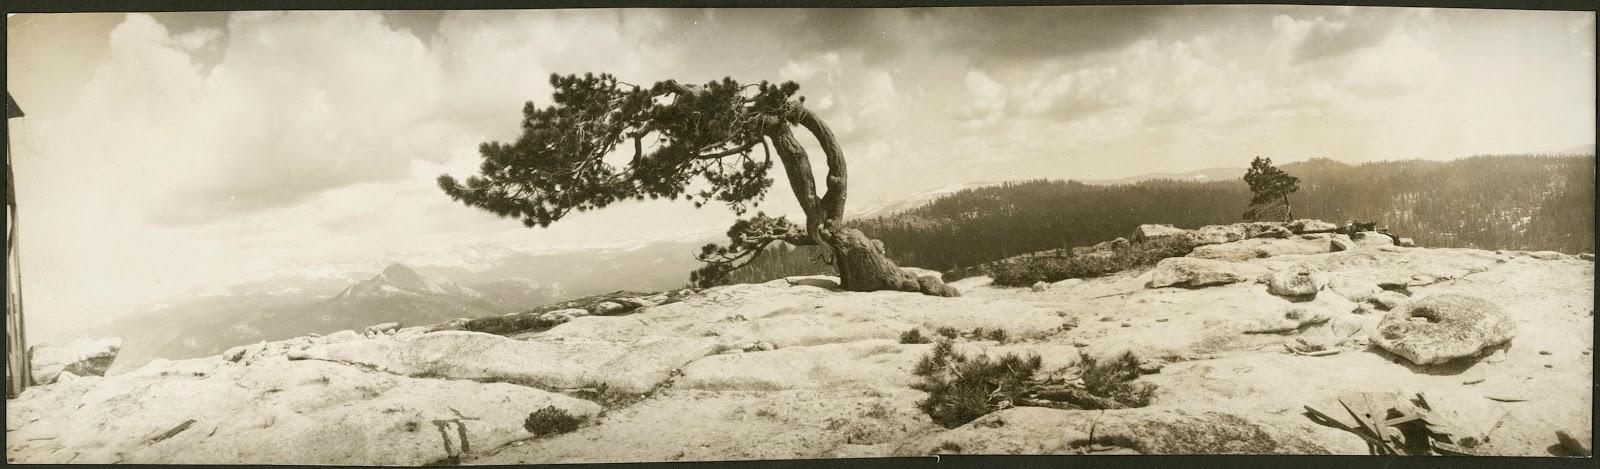 Orotone of Jeffrey's Pine on Sentinel Dome, Yosemite.